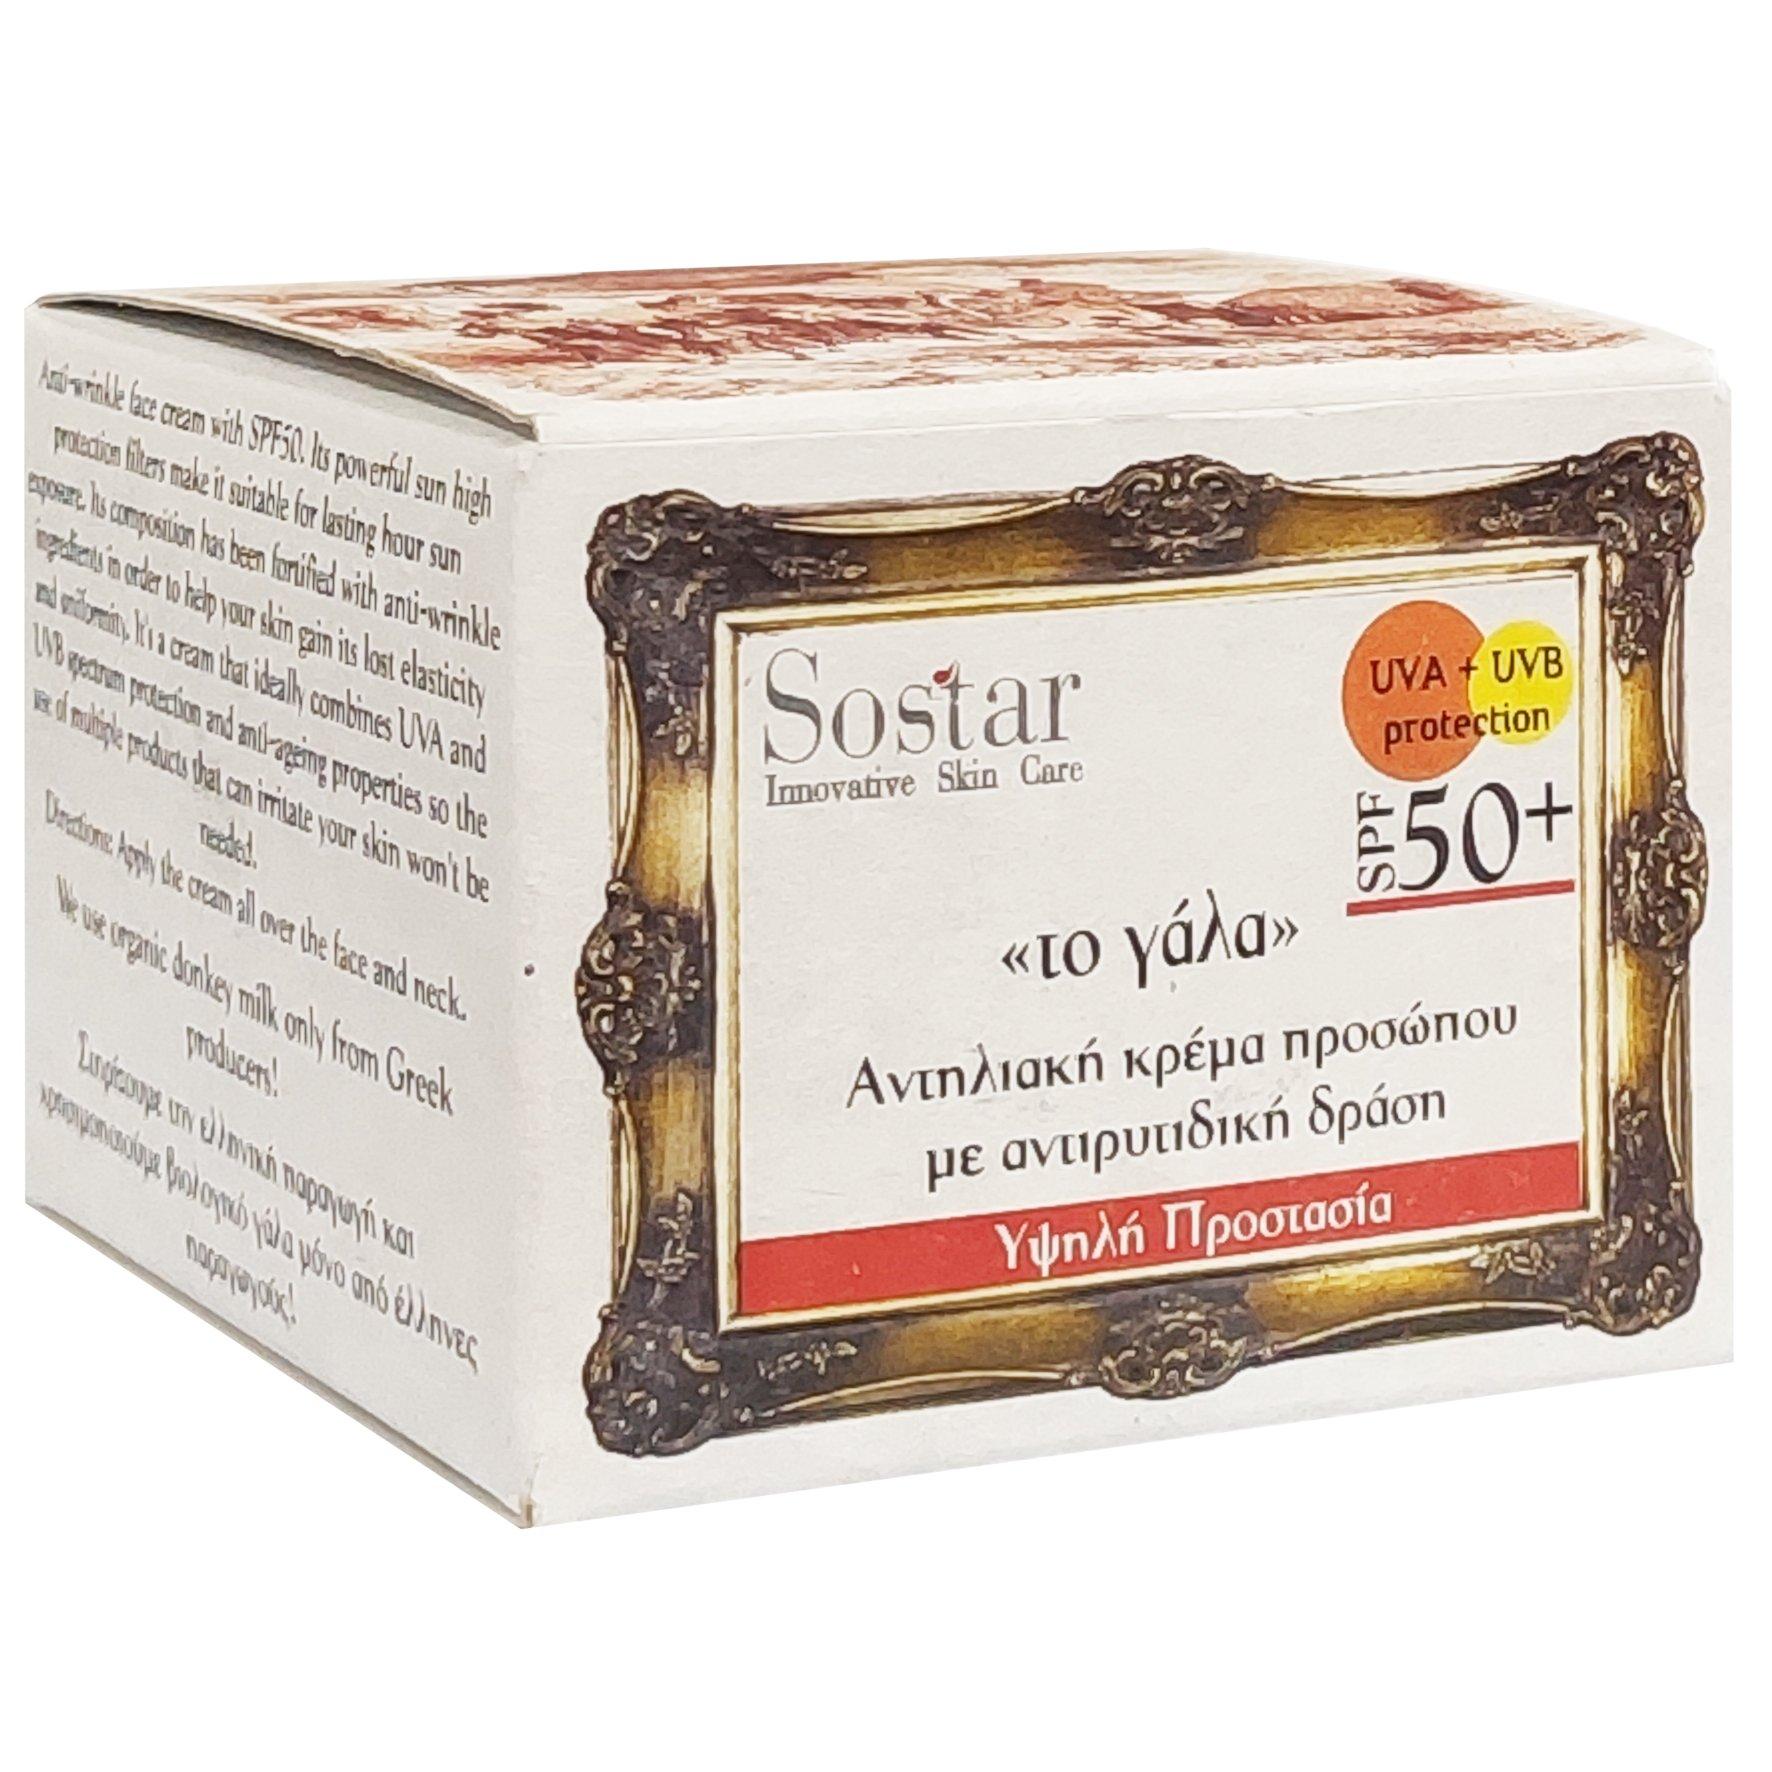 Sostar Αντιγηραντική Κρέμα Προσώπου Spf50 με Βιολογικό Γάλα Γαϊδούρας 50ml